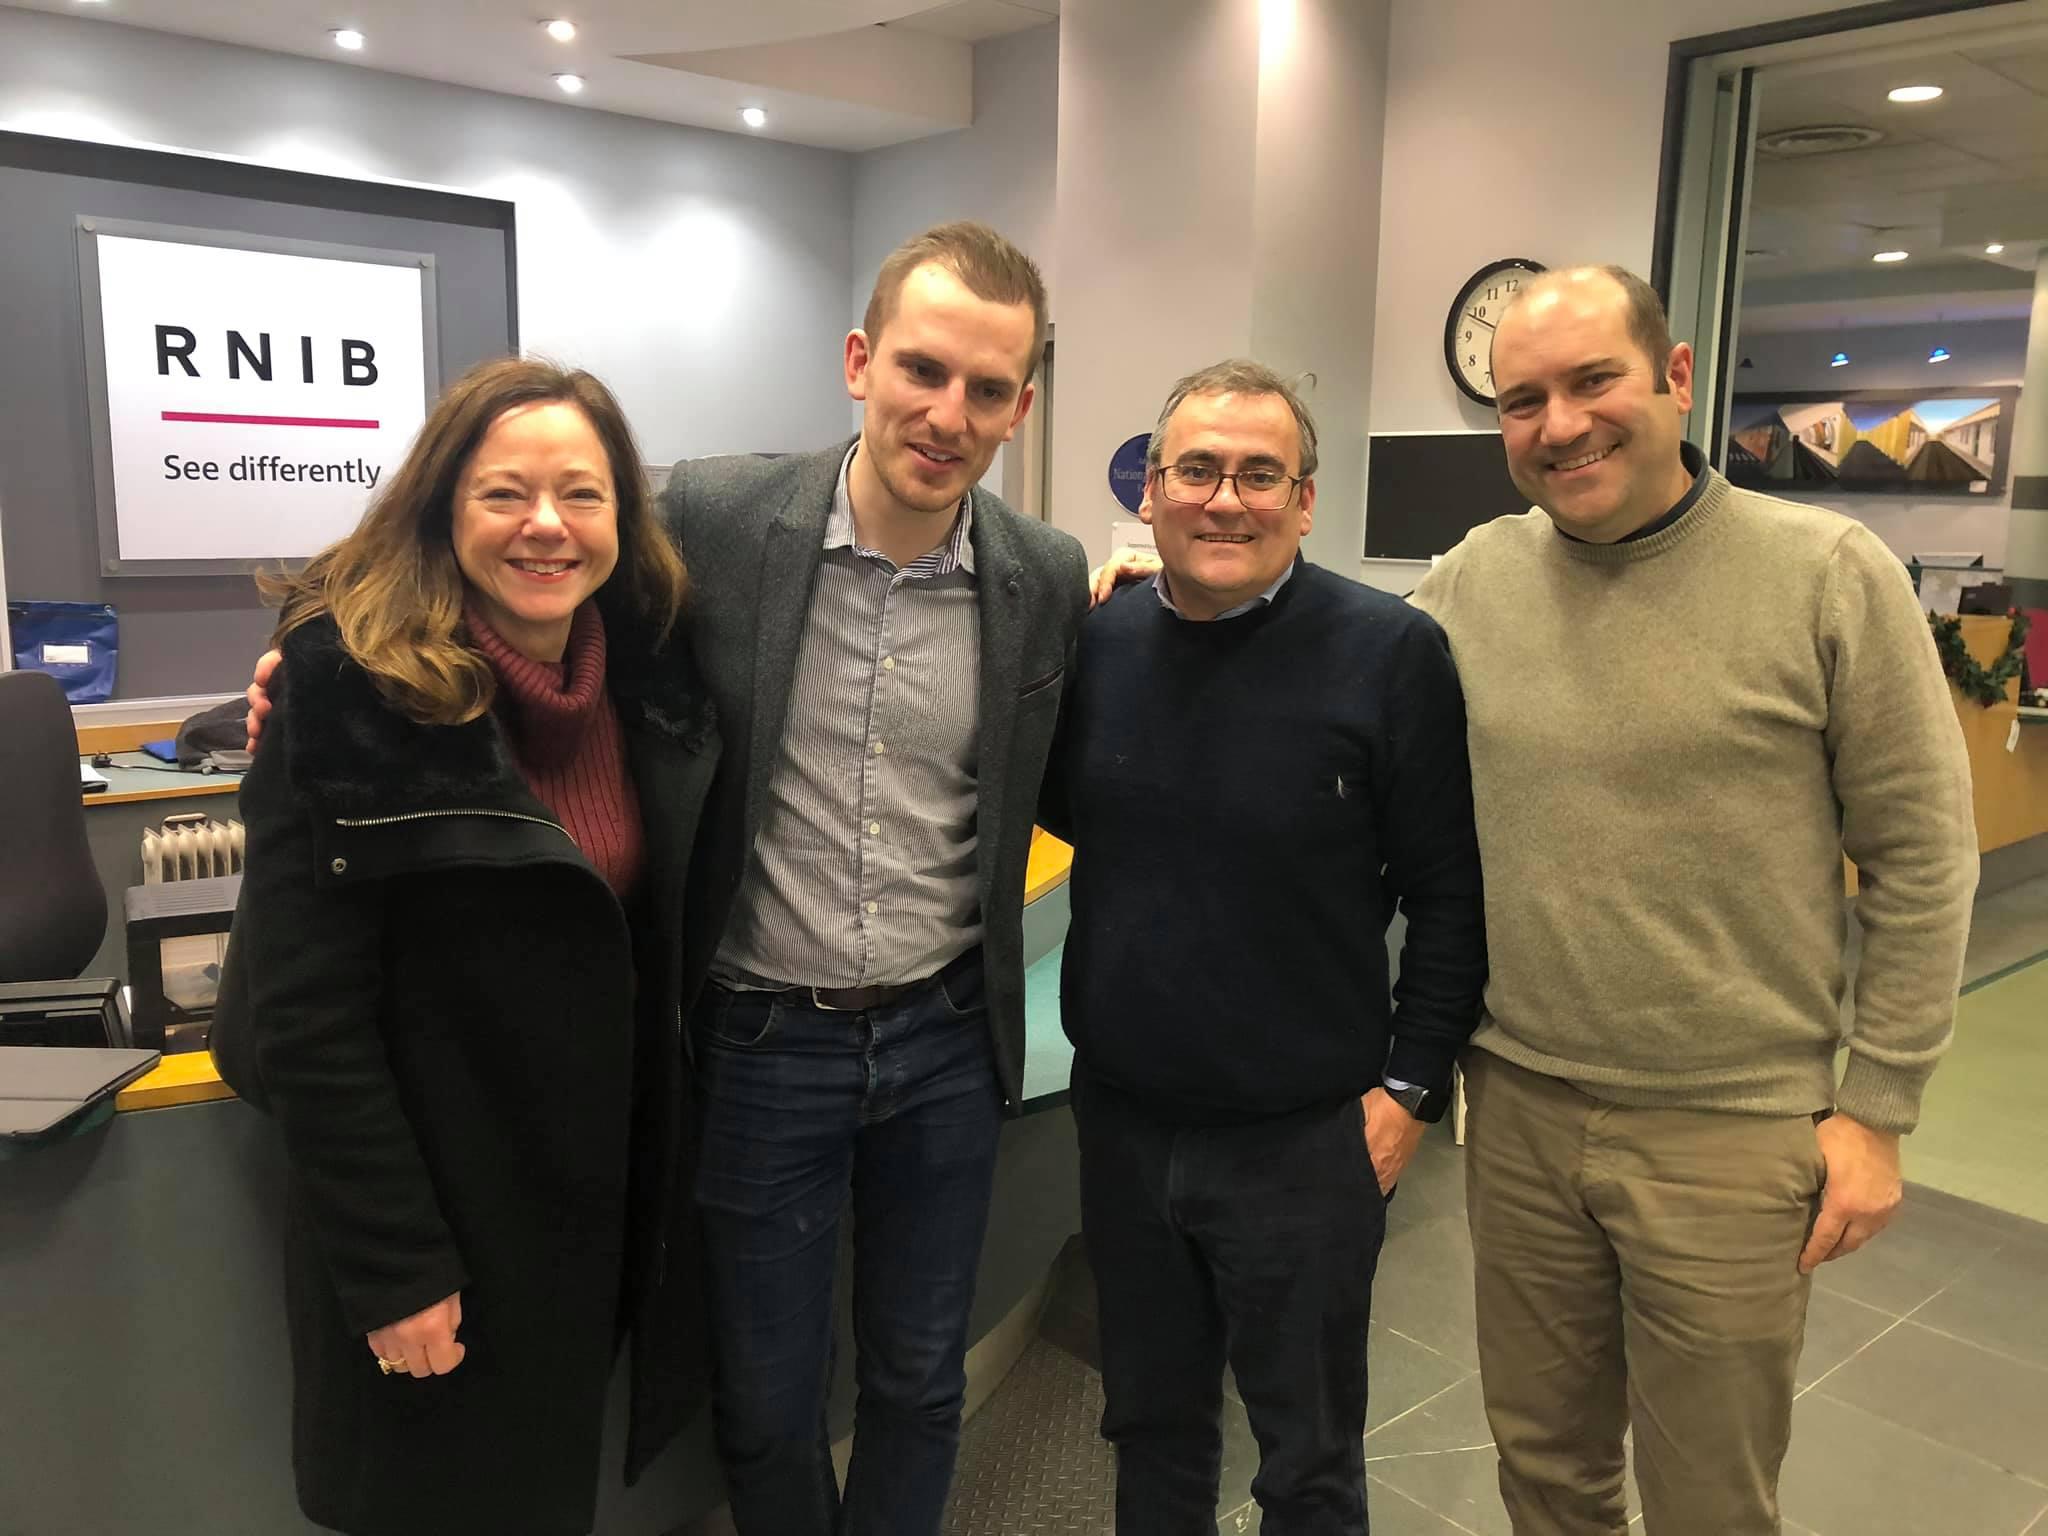 myEyes colabora com RNIB